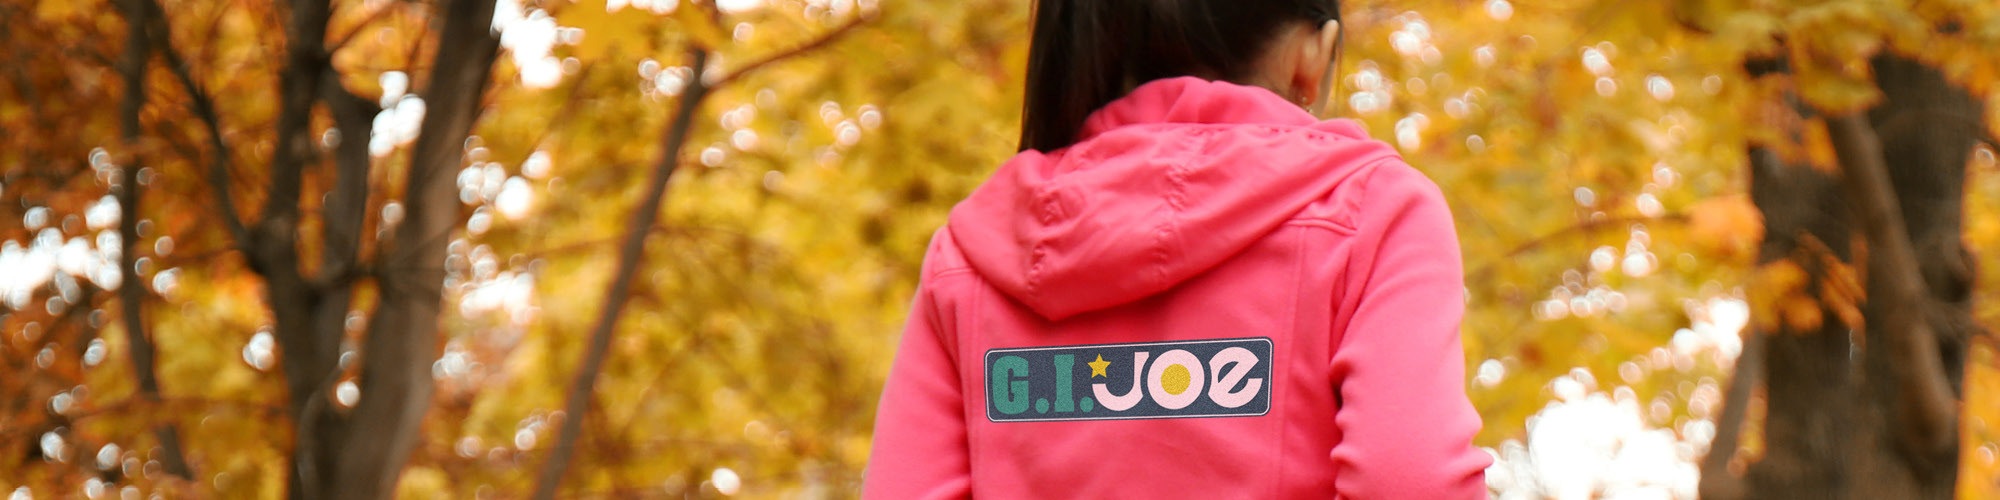 Joe gijoe caroussel 2